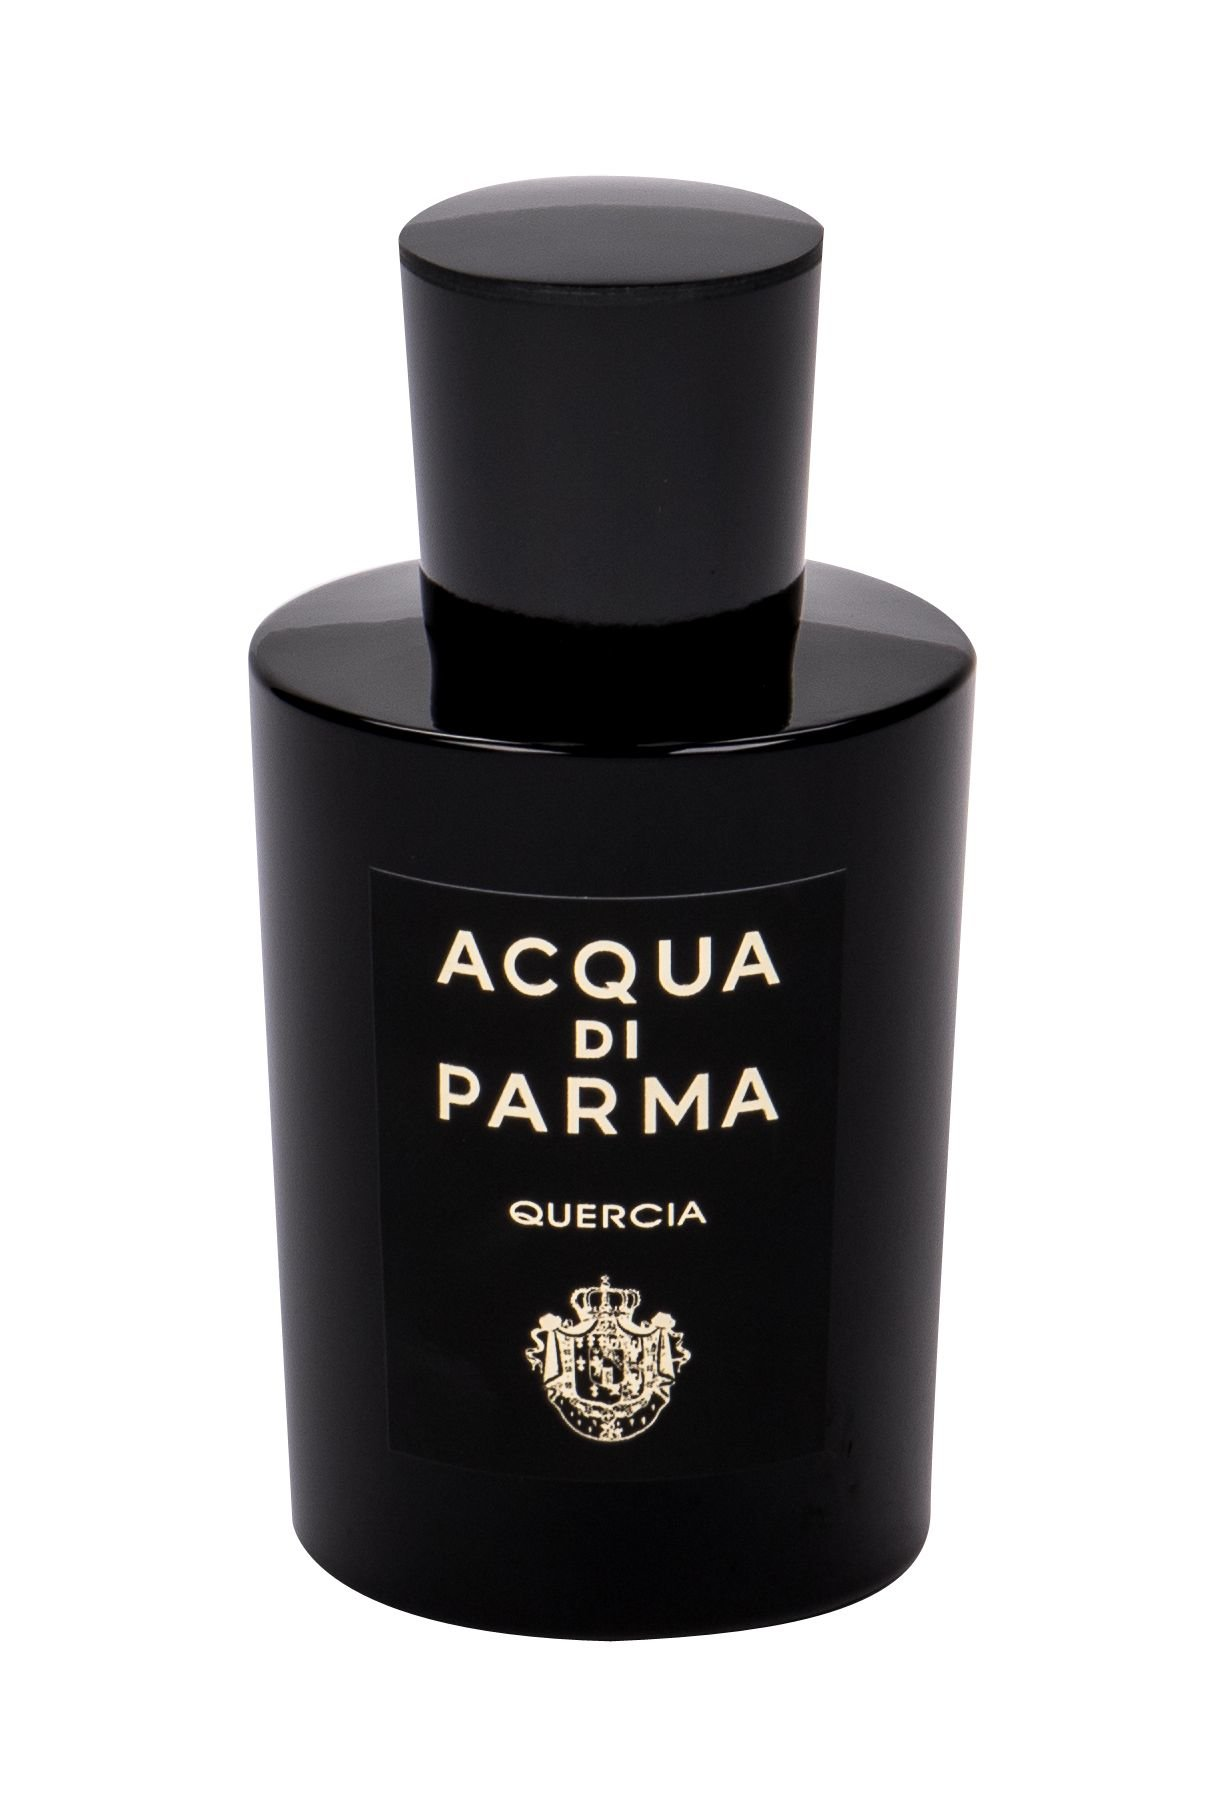 Acqua di Parma Quercia Eau de Parfum 100ml